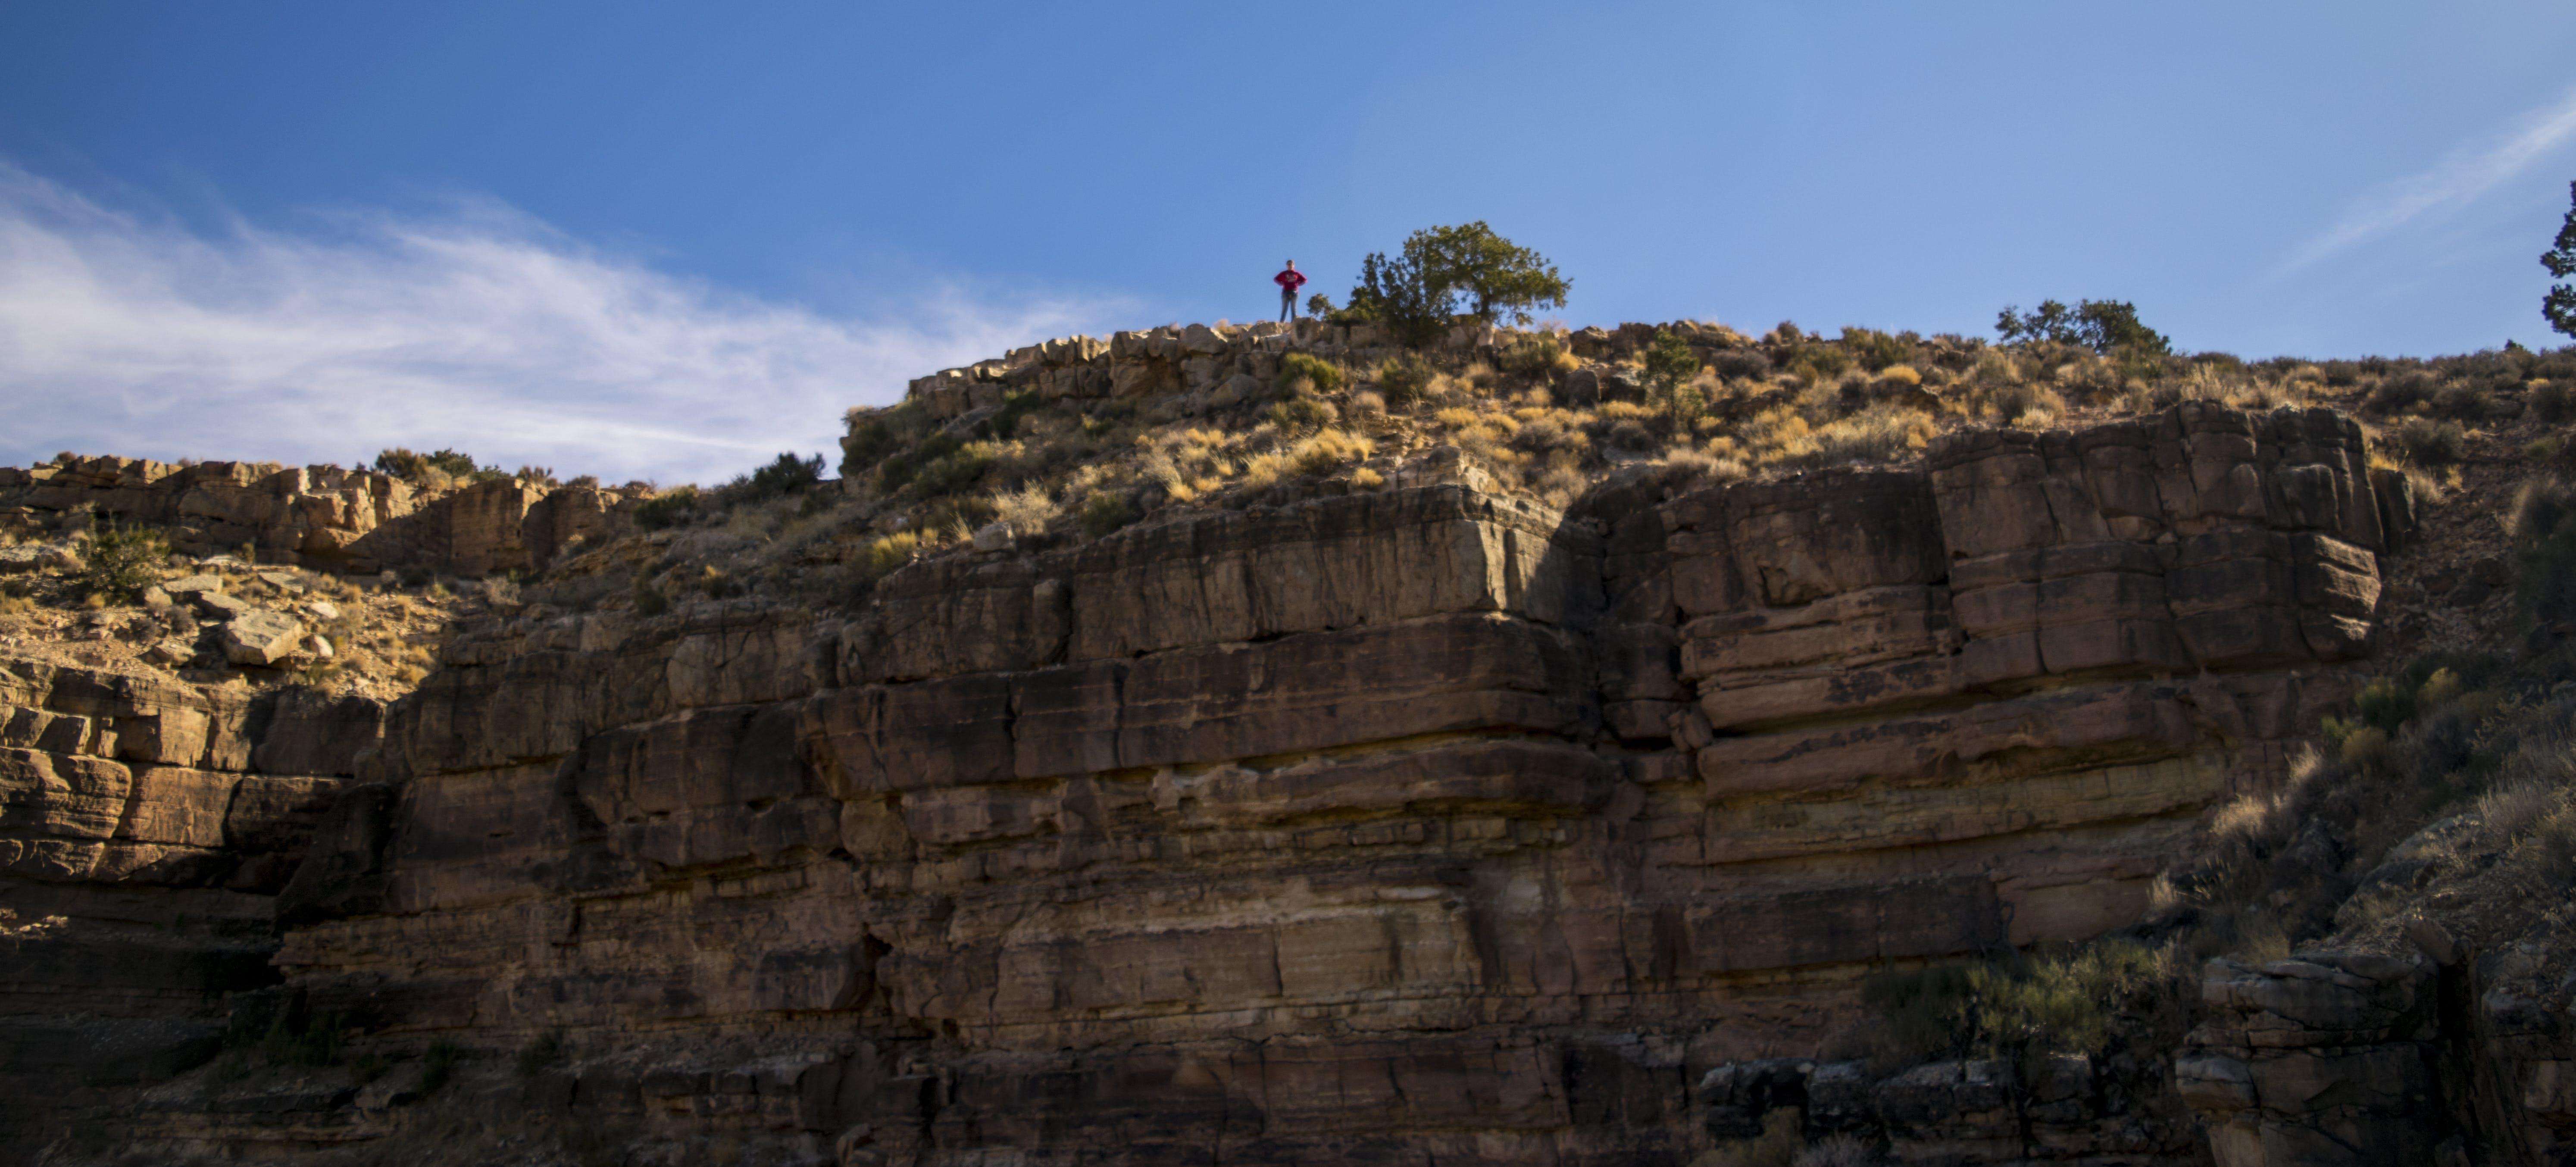 Free stock photo of alone, climb, height, high